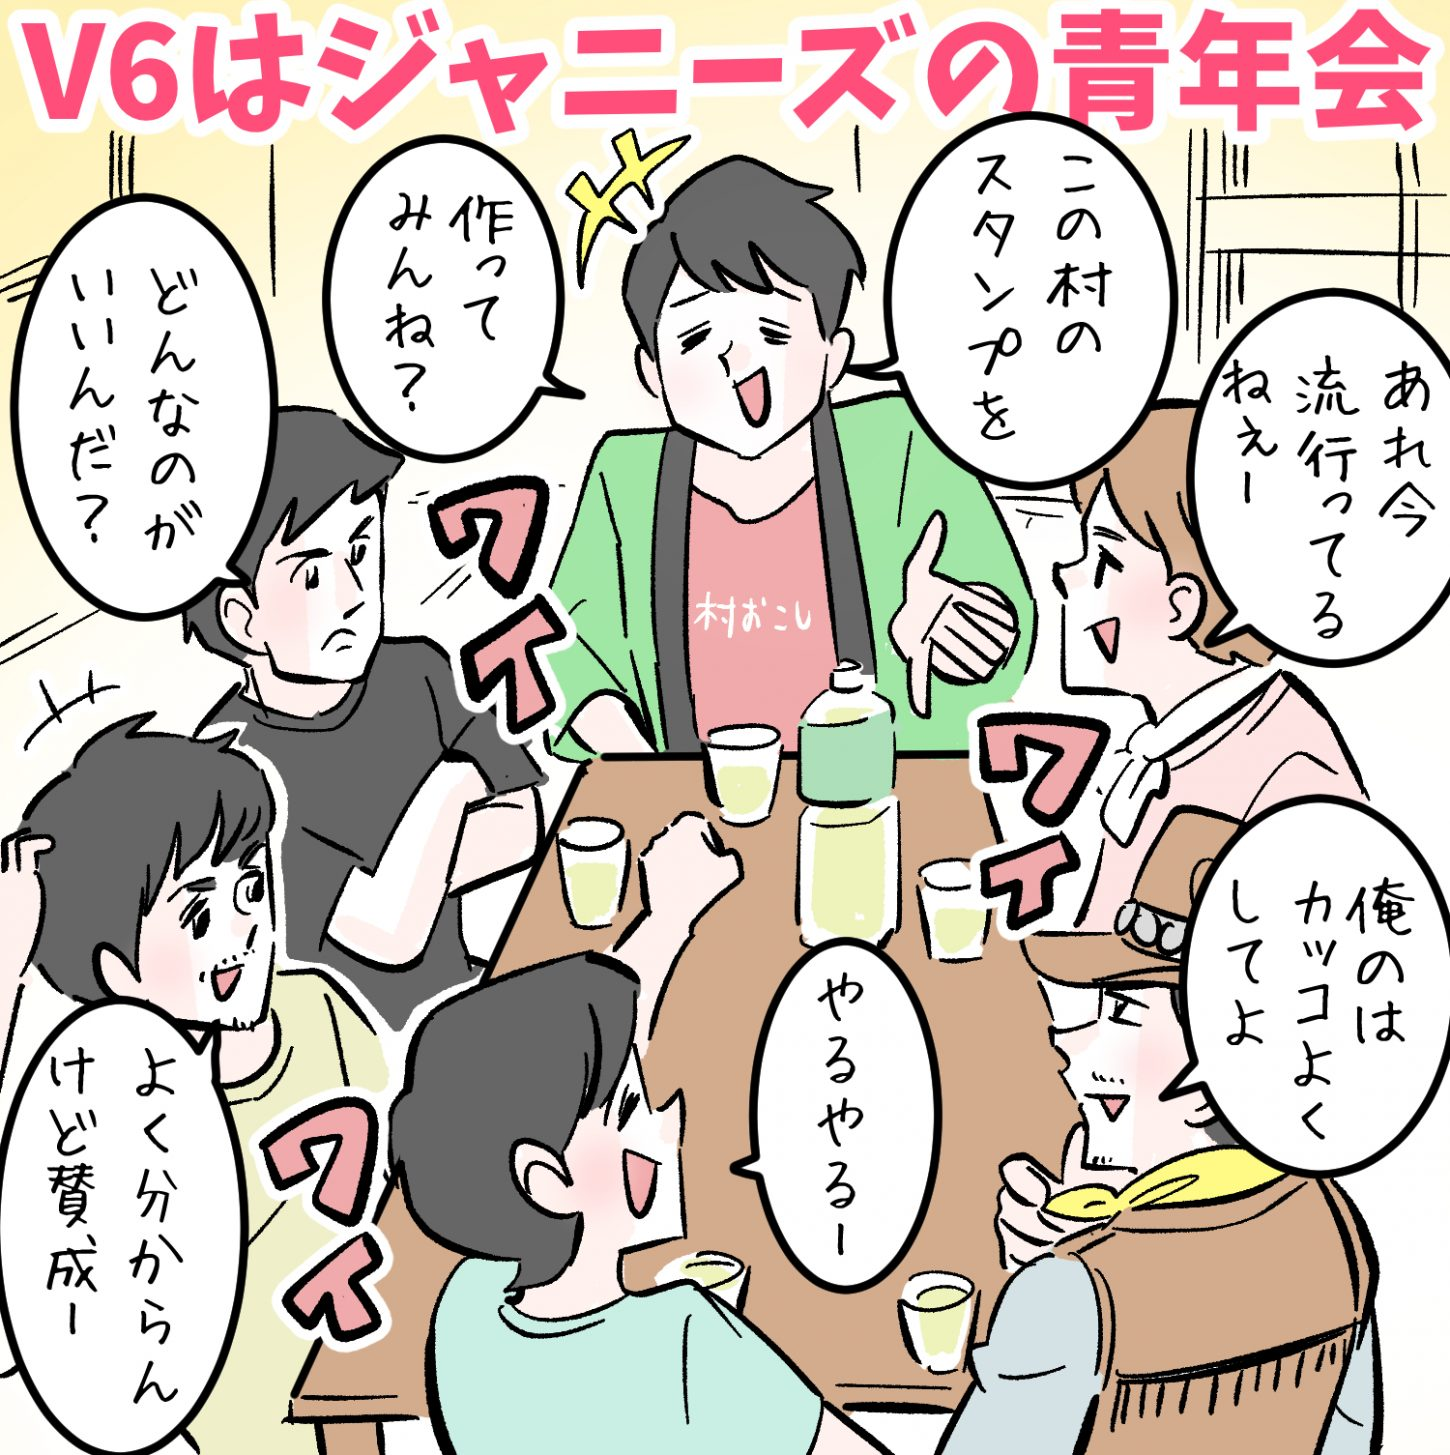 "V6は愛すべきジャニーズの""青年会""、会議動画にほんわかしちゃう"